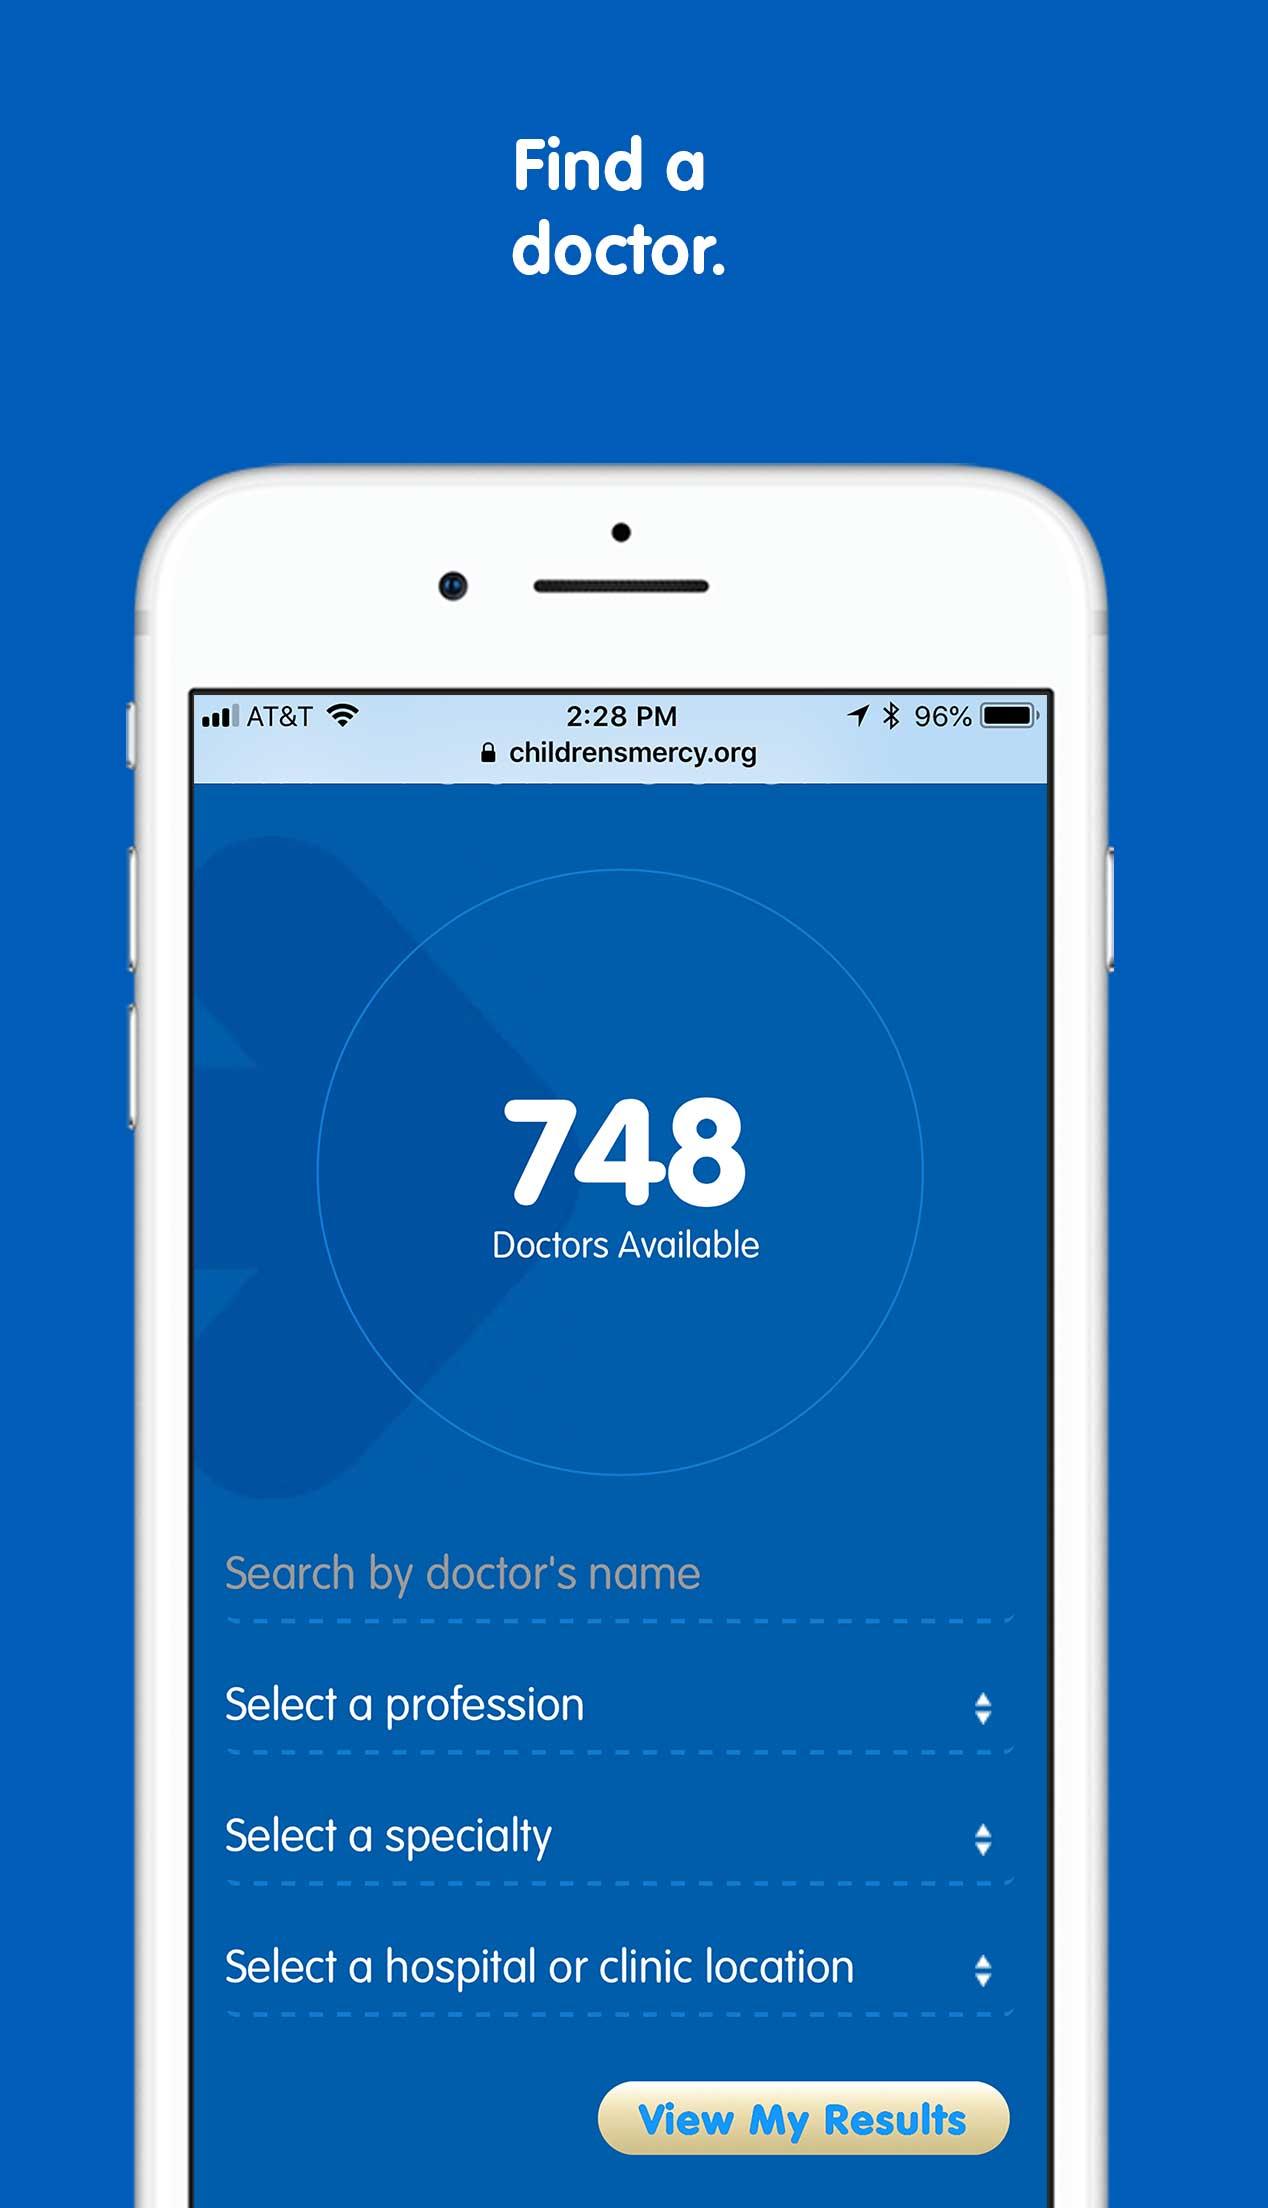 Children's Mercy app Find a Doctor screen